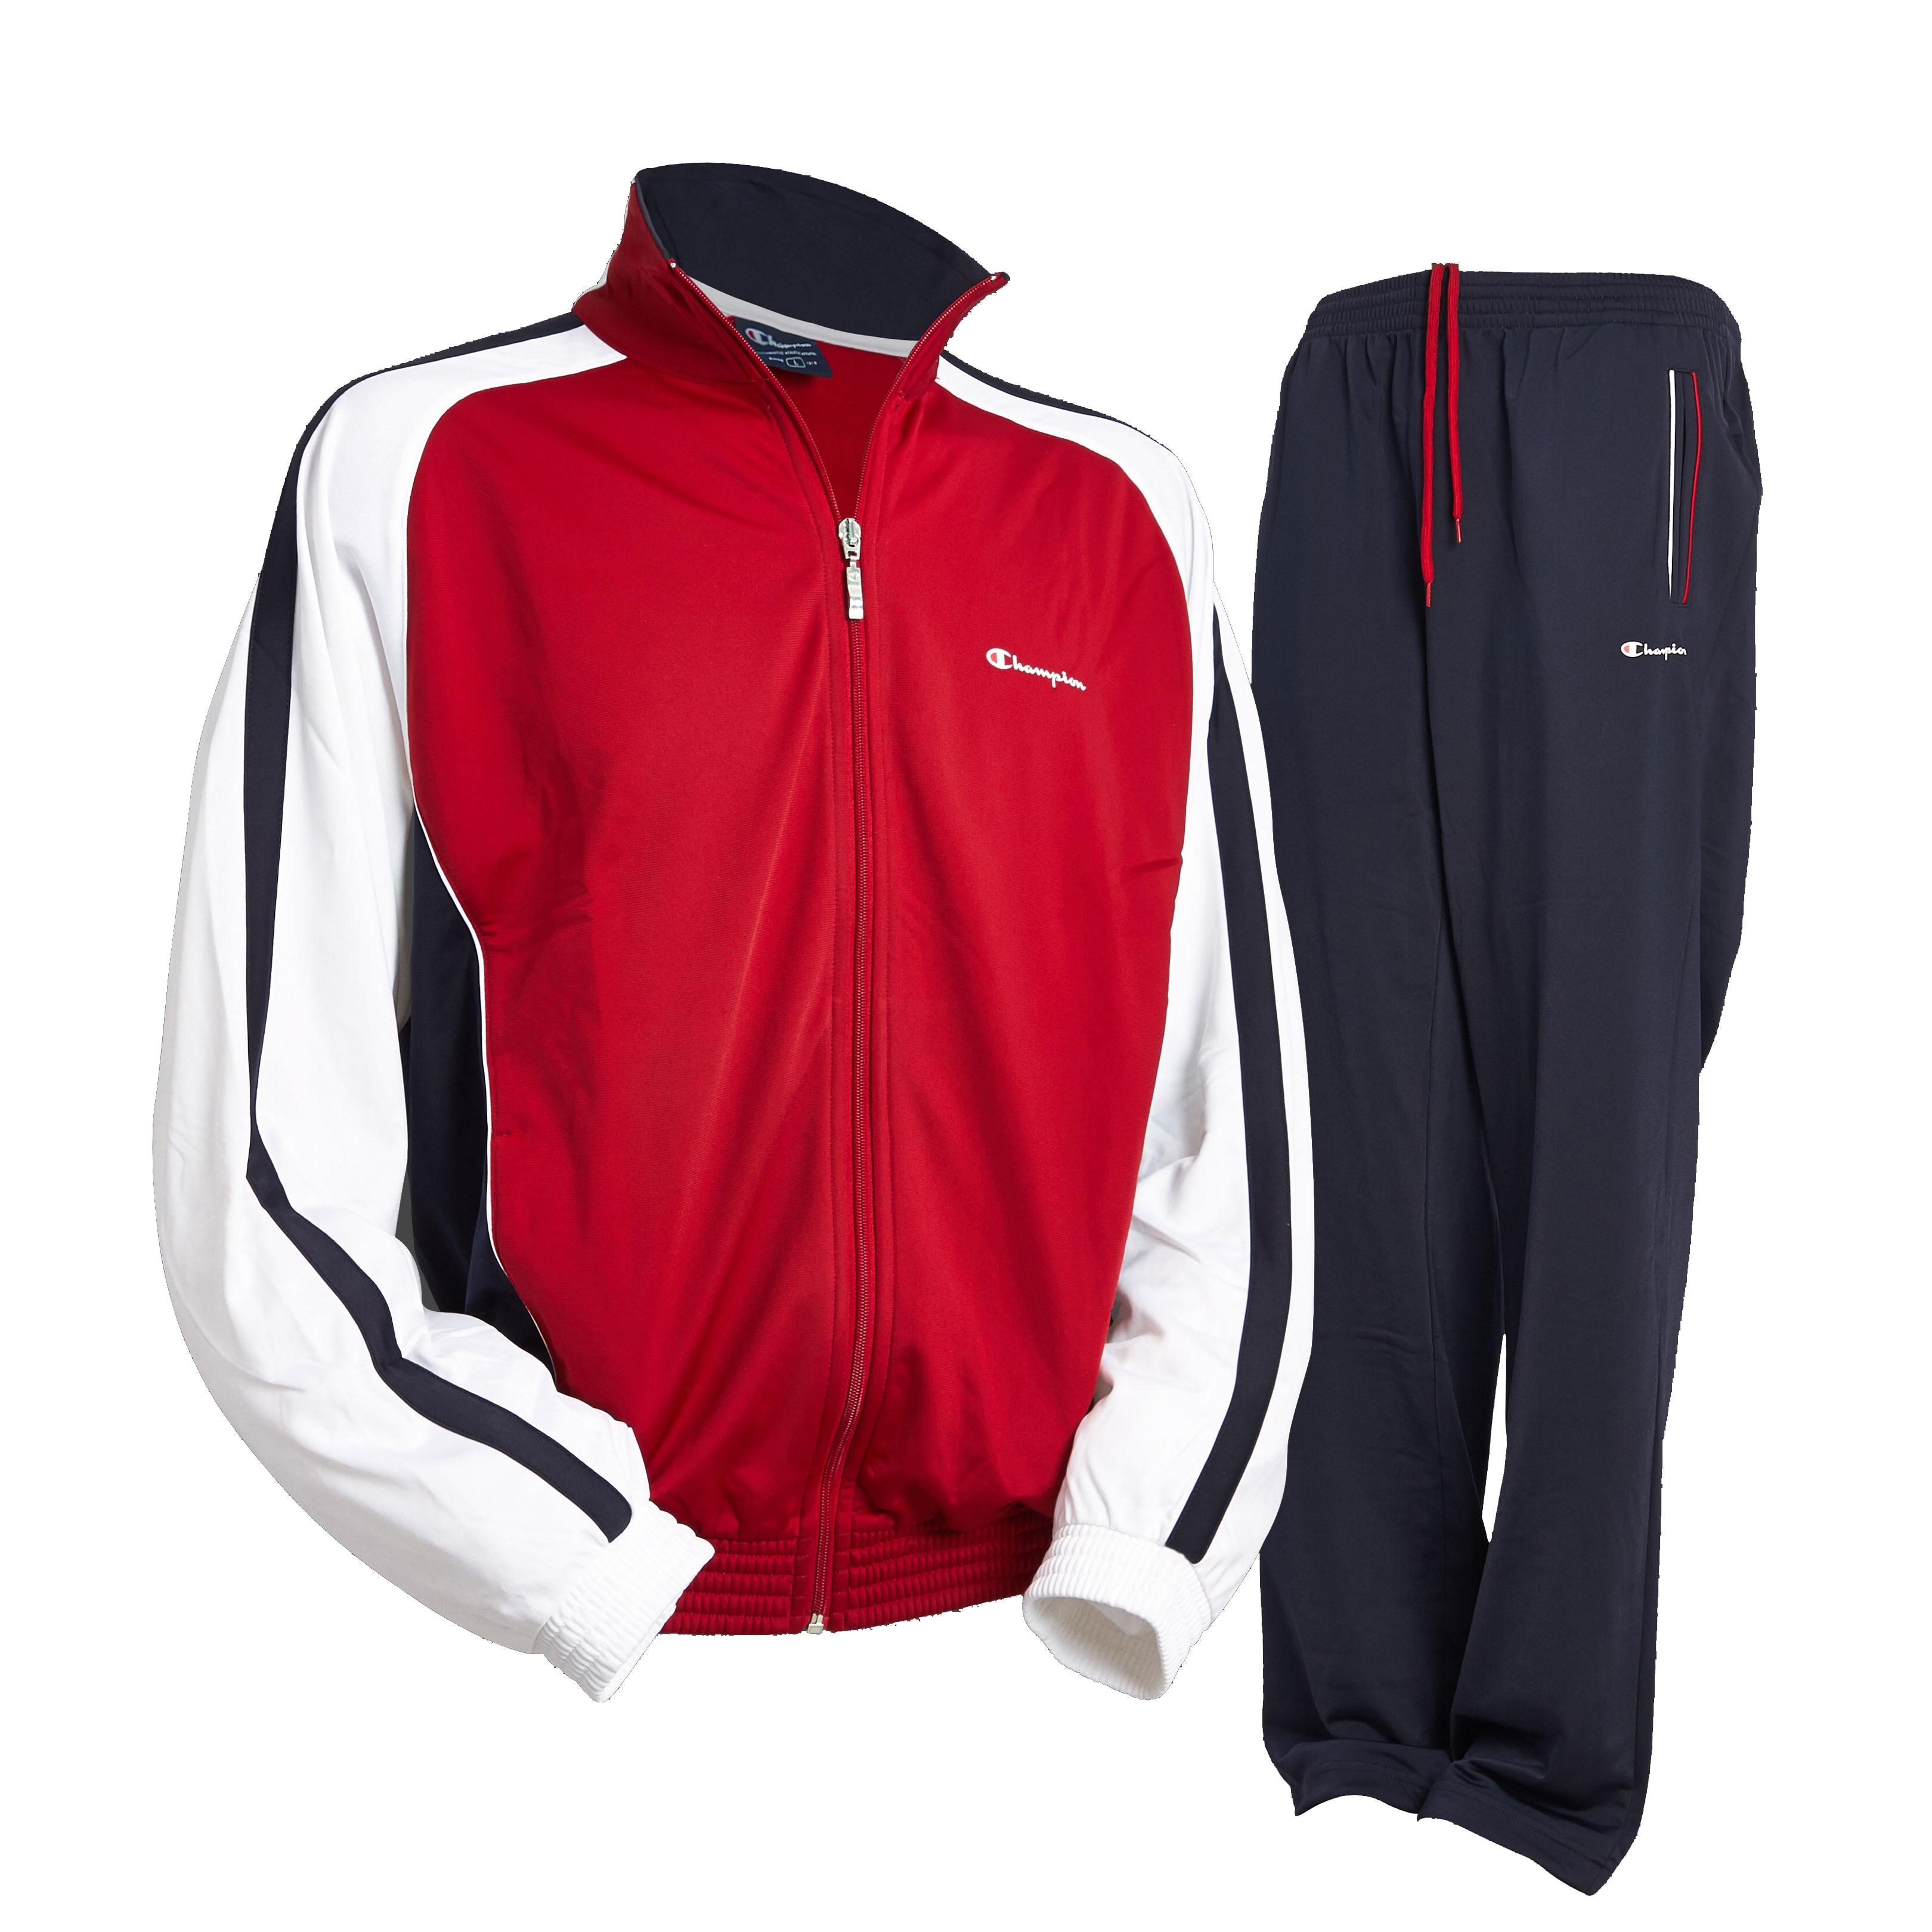 Adidas Mens Jogging Suits Images Best Ideas About